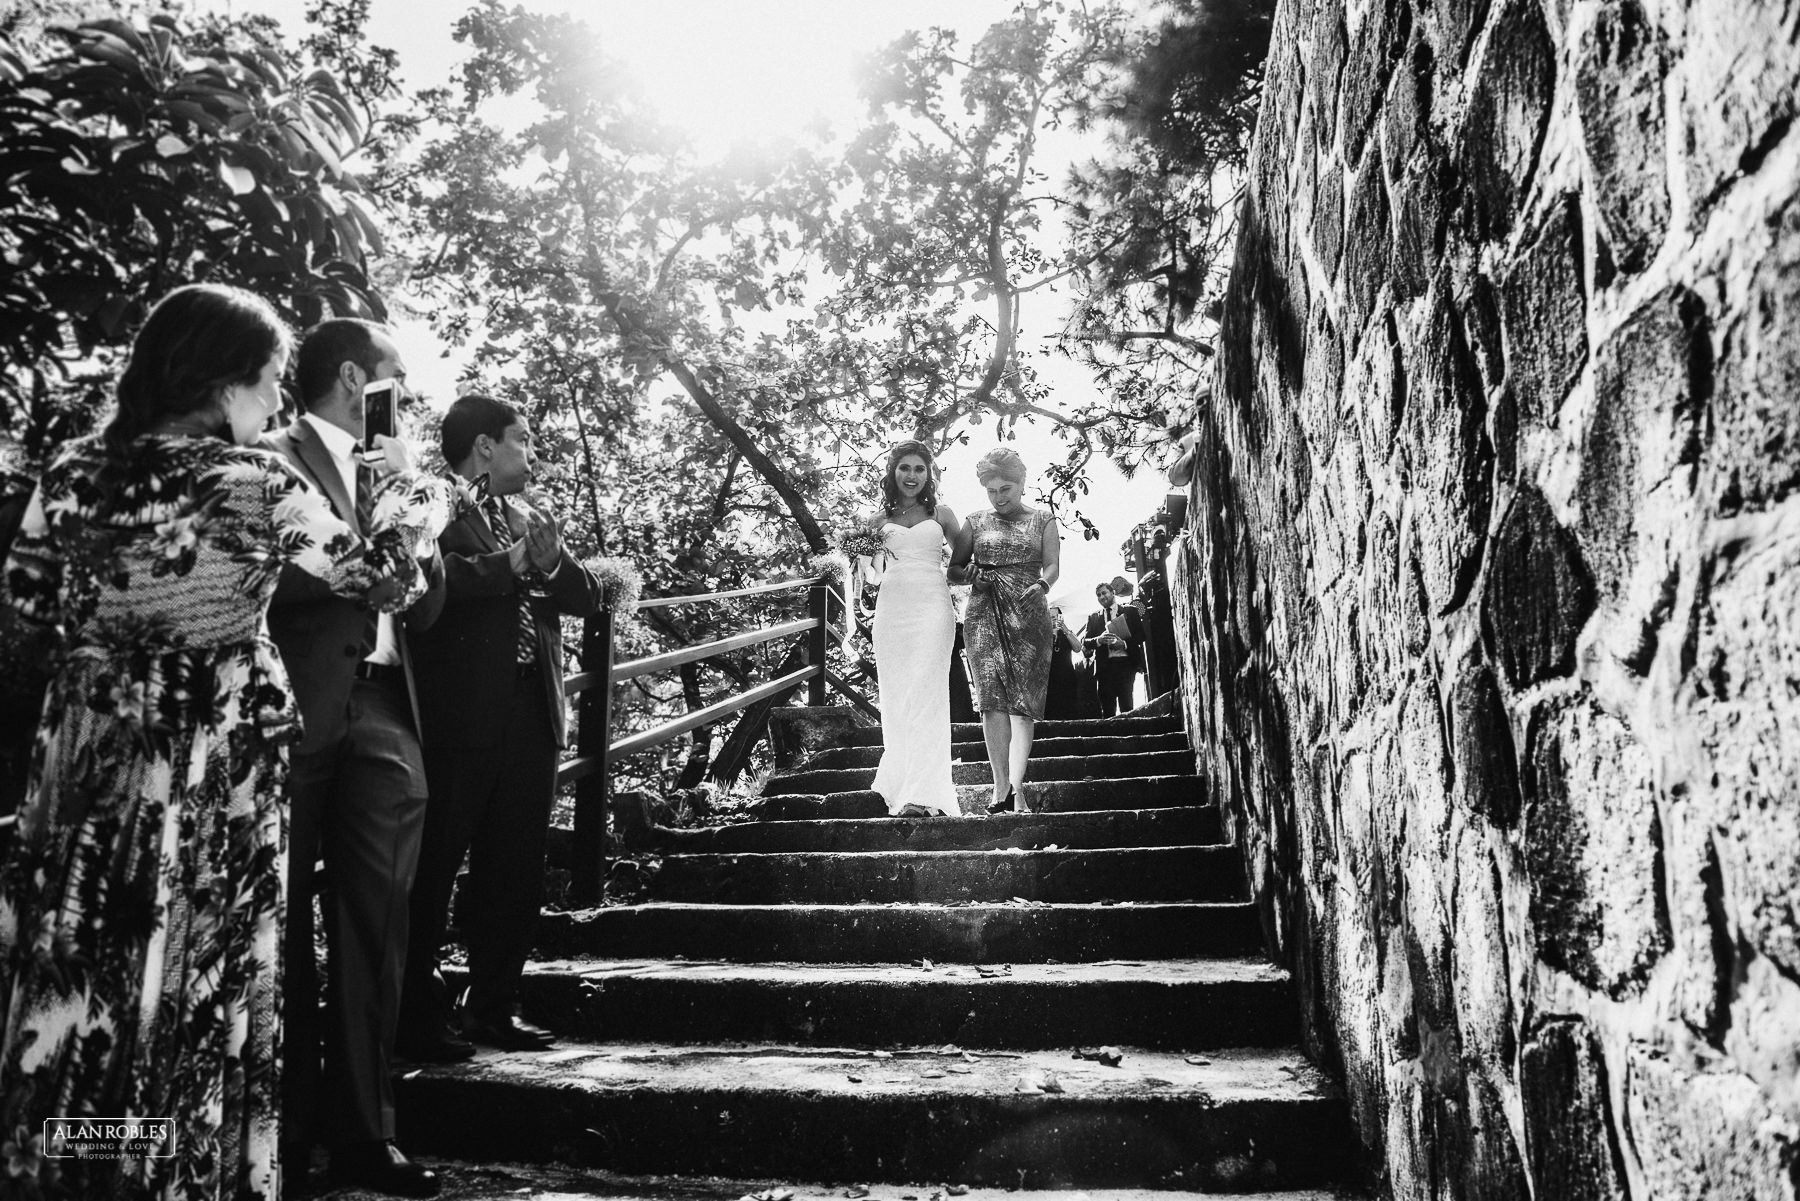 Fotografo de bodas guadalajara Alan Robles - Pinare terraza bistro 32